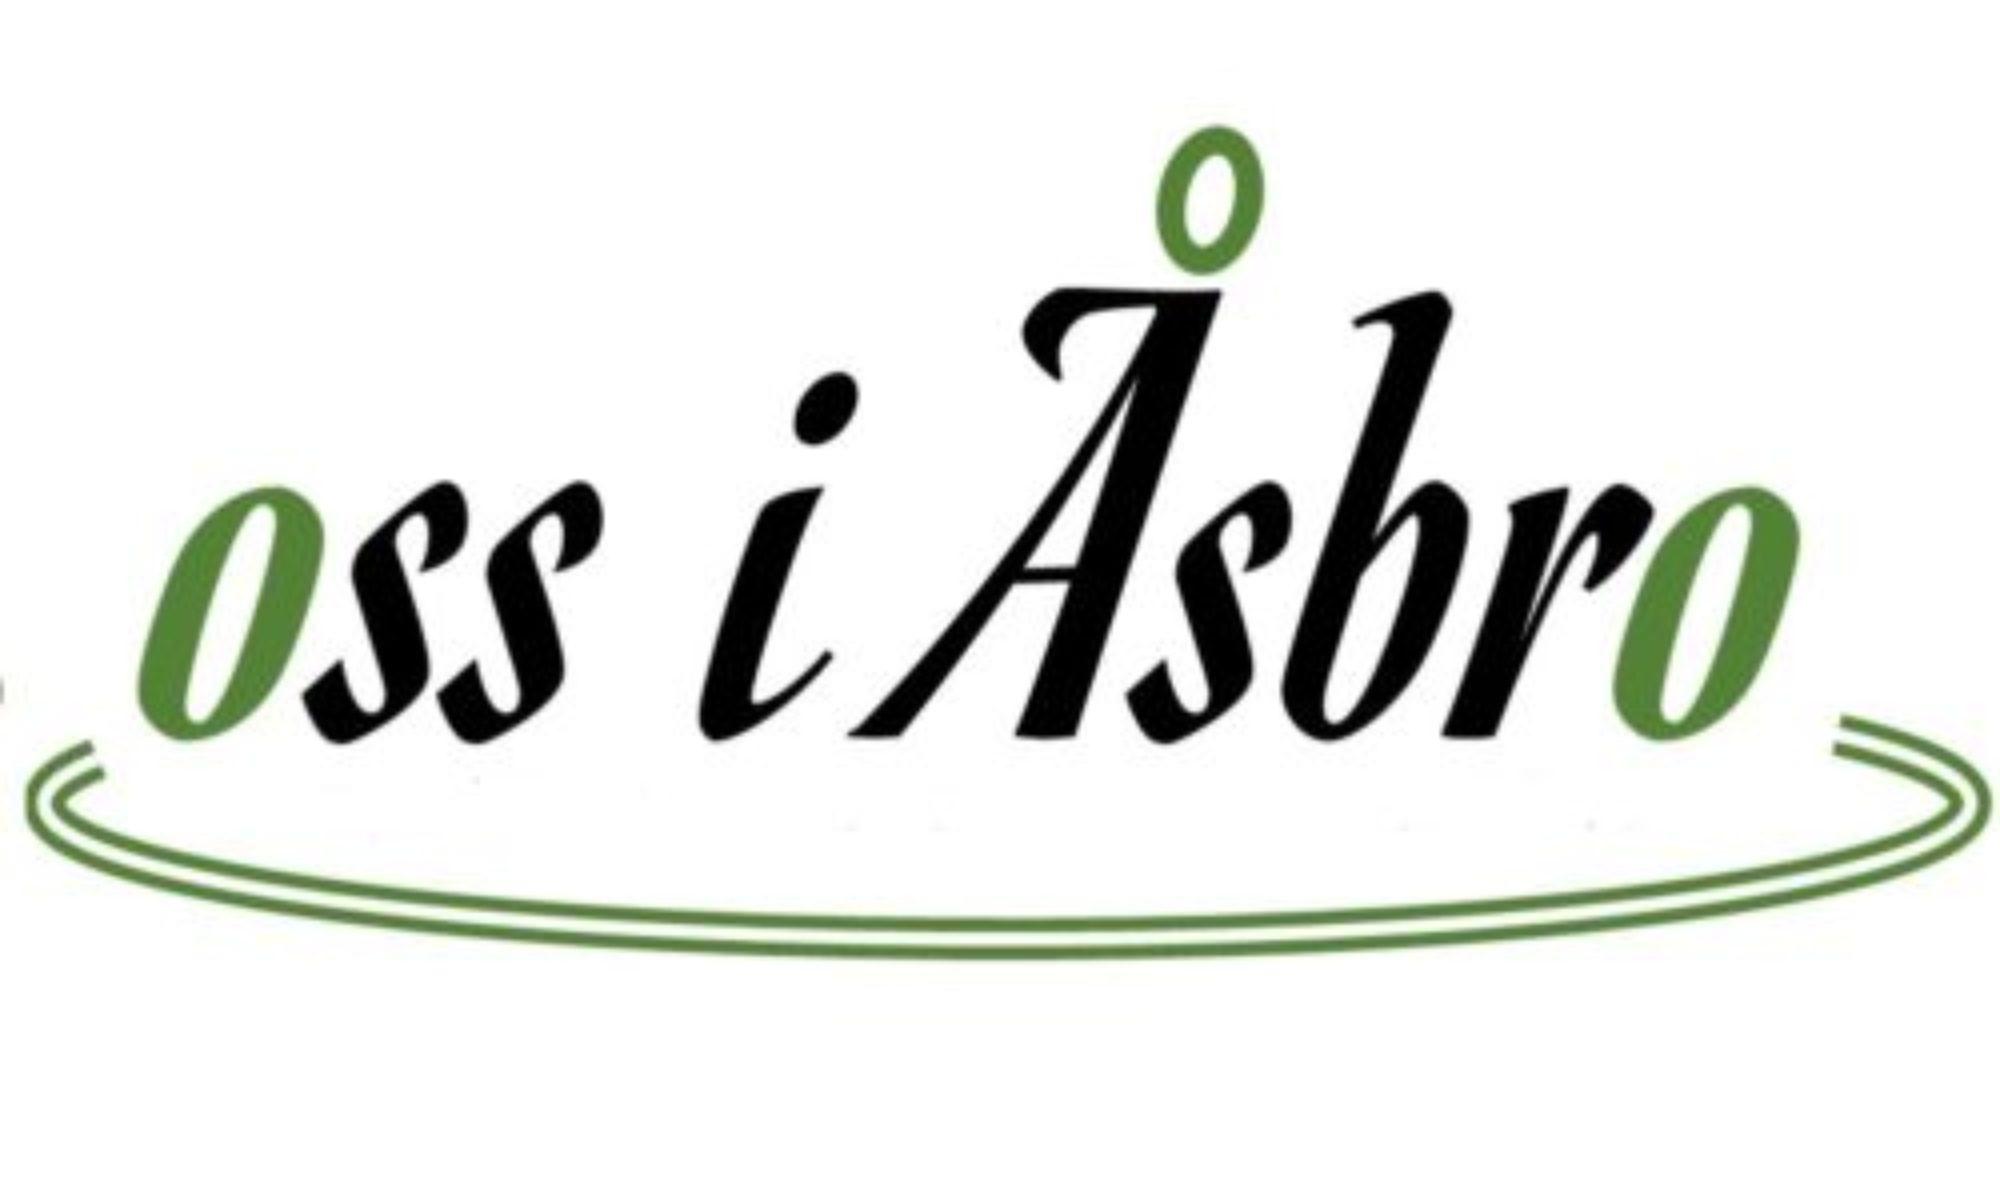 OSS i Åsbro